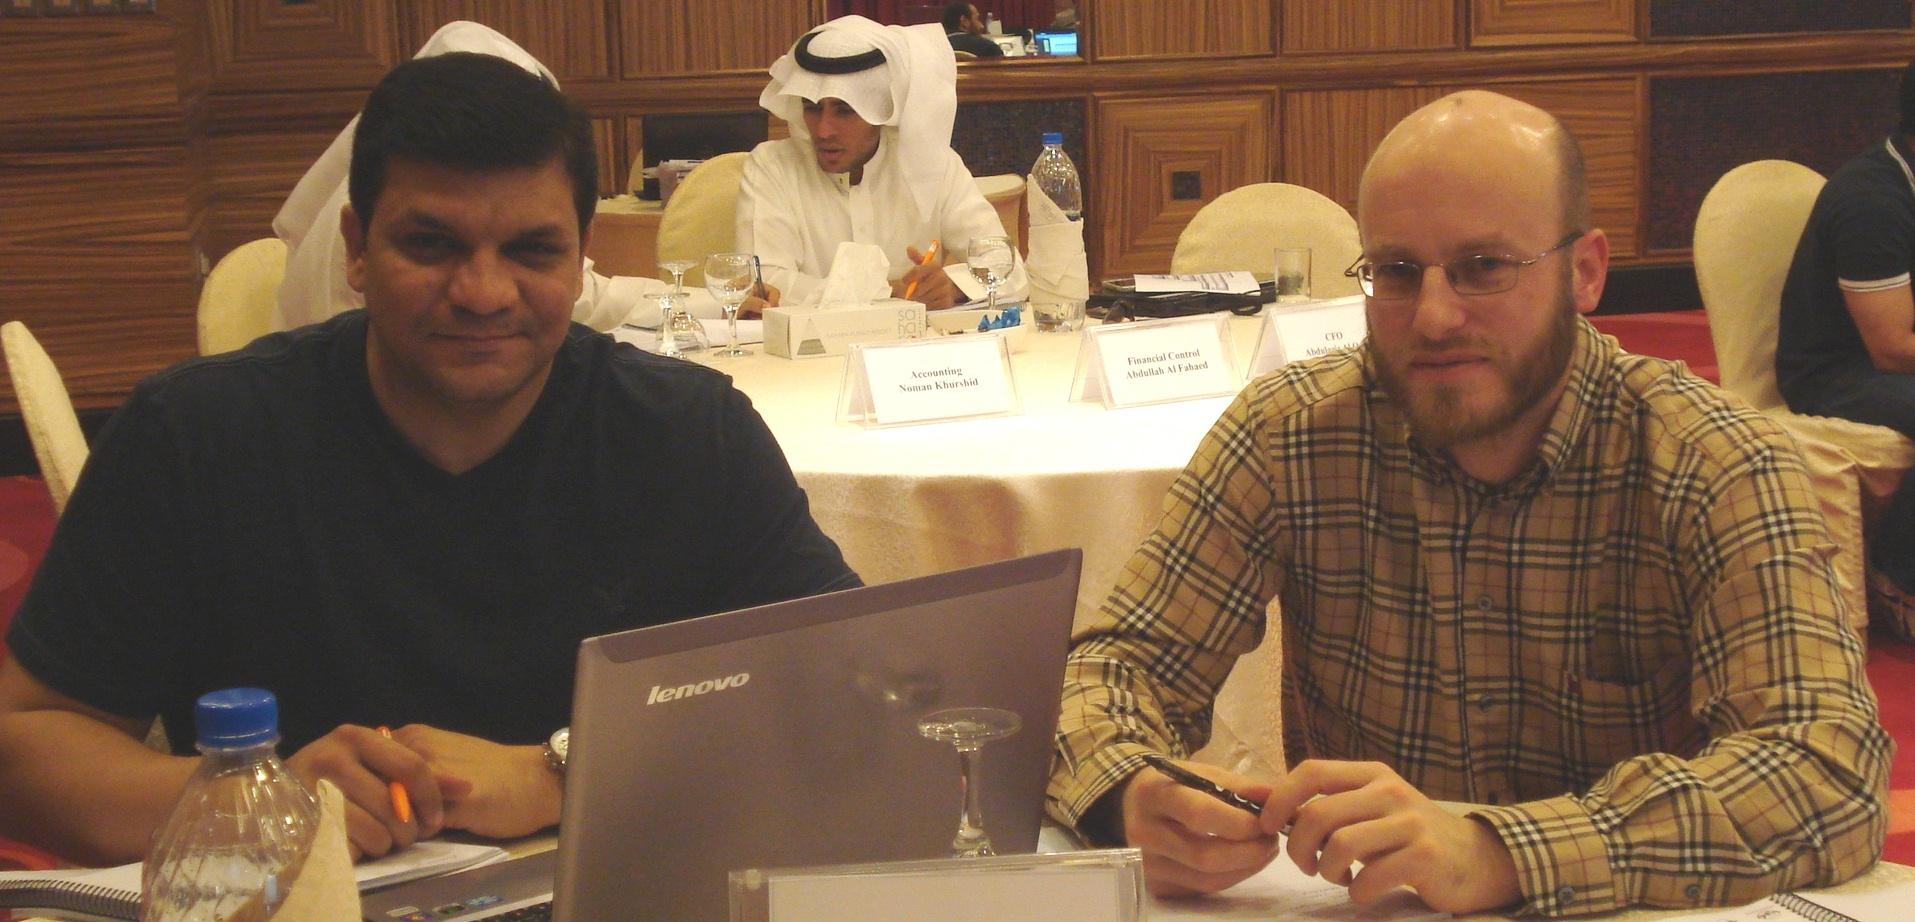 Waseem Nawaz (Pricing & Costing Senior Manager) and Mustafa Davies (Financial Control Director)